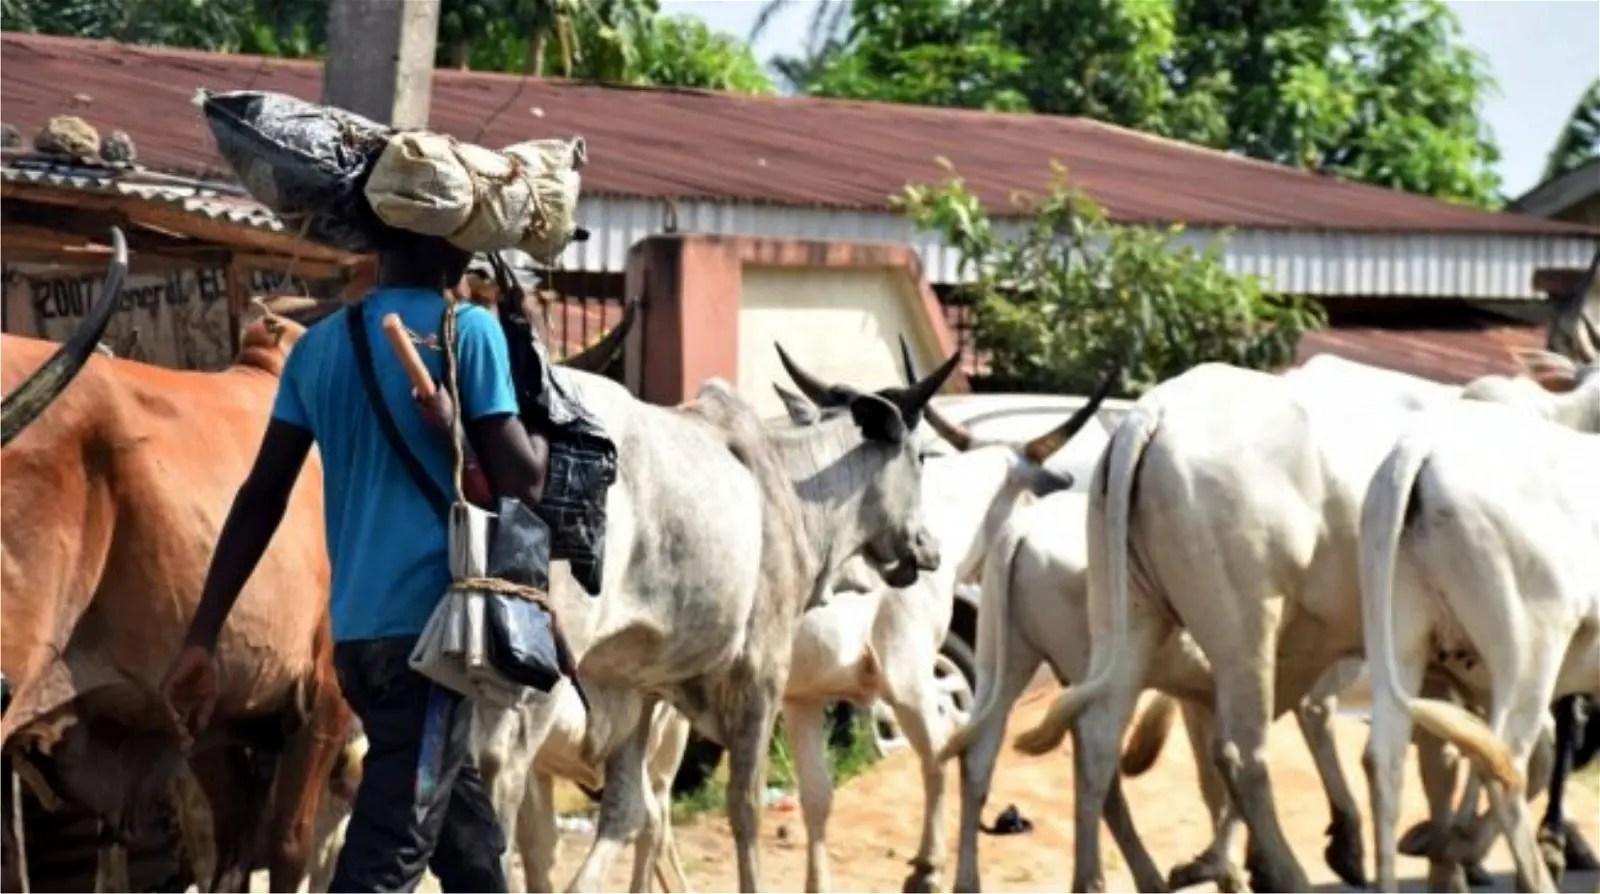 Forgive us, herdsmen beg Imo community - Vanguard